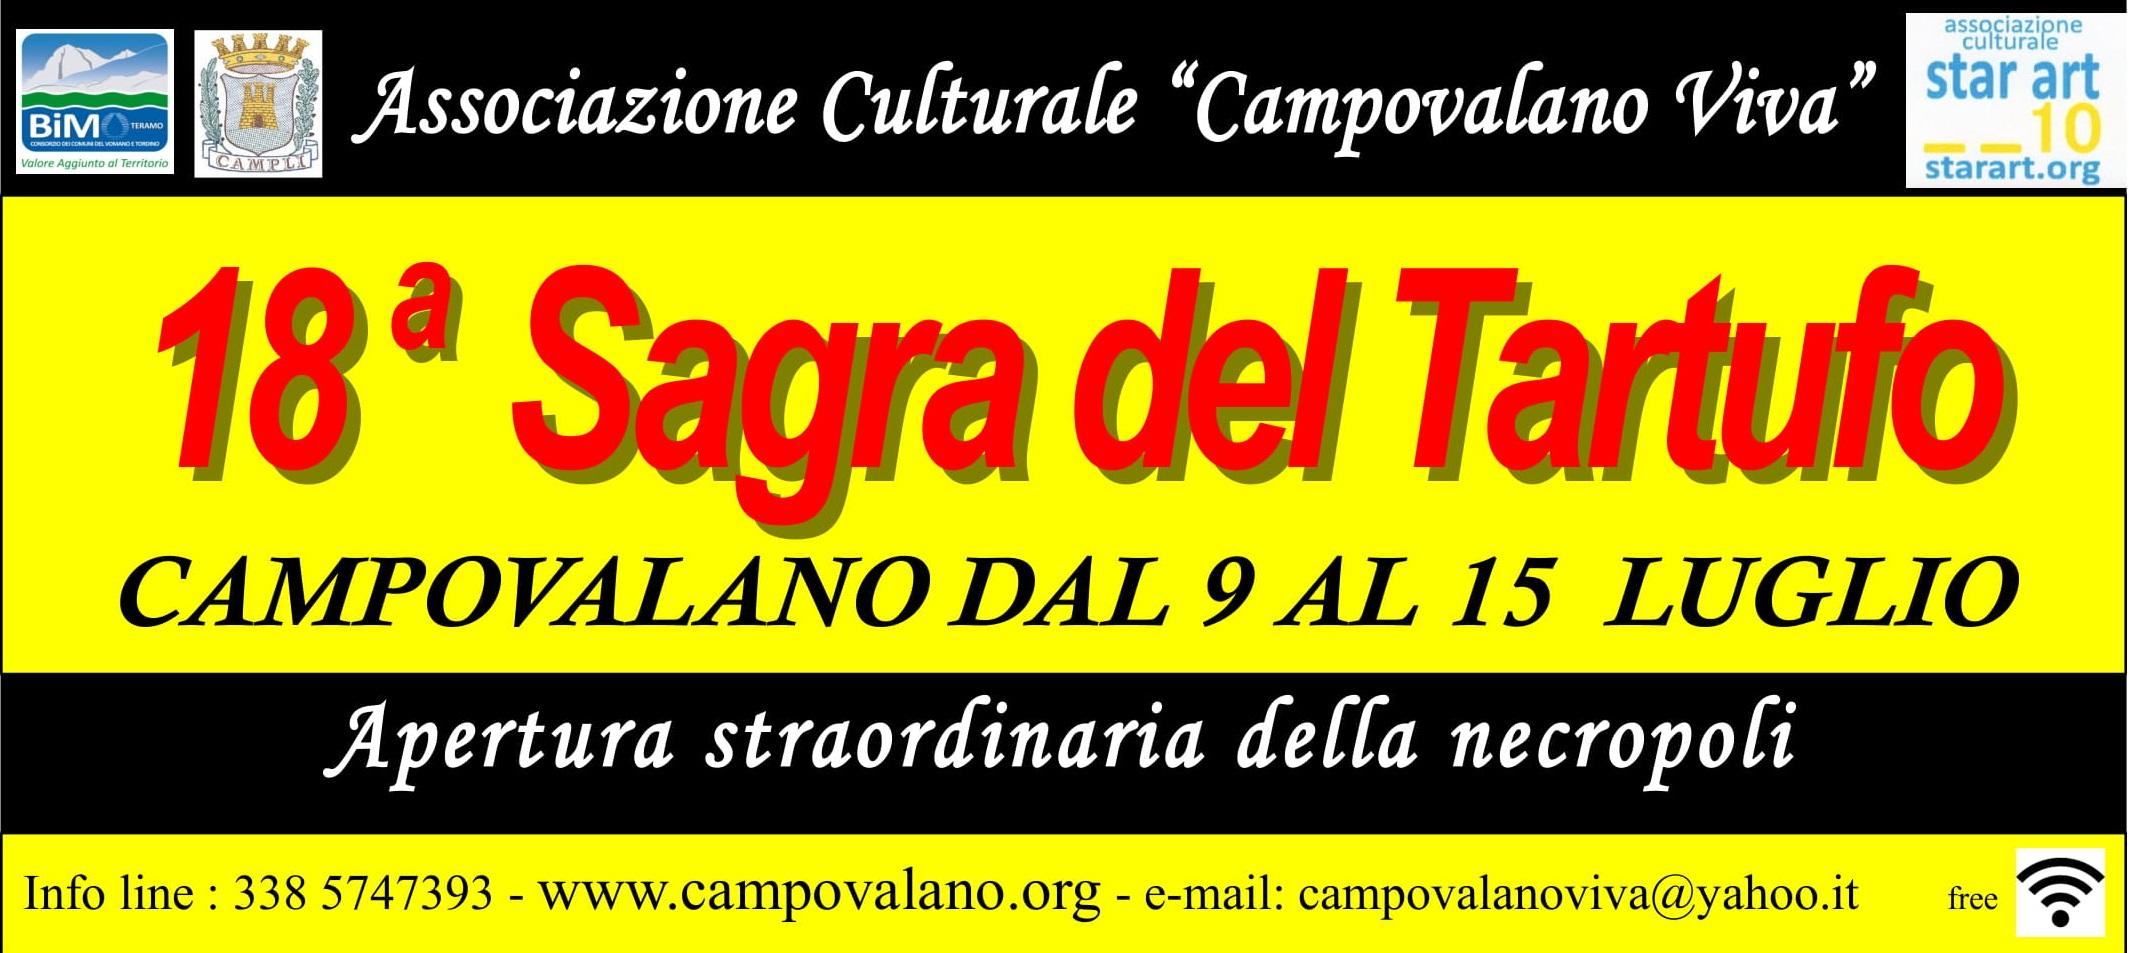 Sagra del Tartufo 2018 – Campovalano Viva